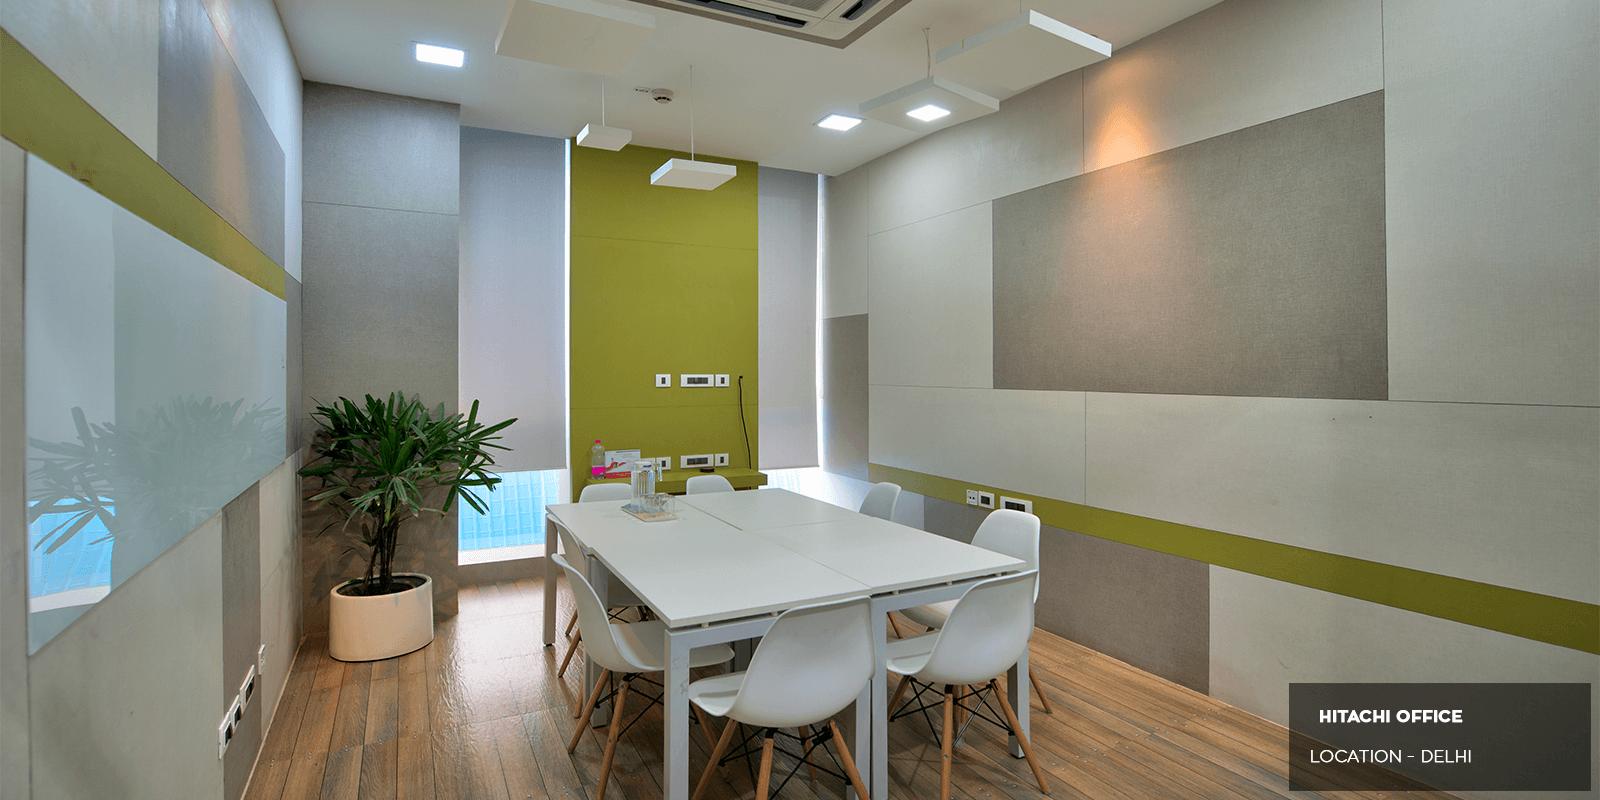 hitachi2-the-novarch-architects-best-architects-in-cr-park-south-delhi-110019